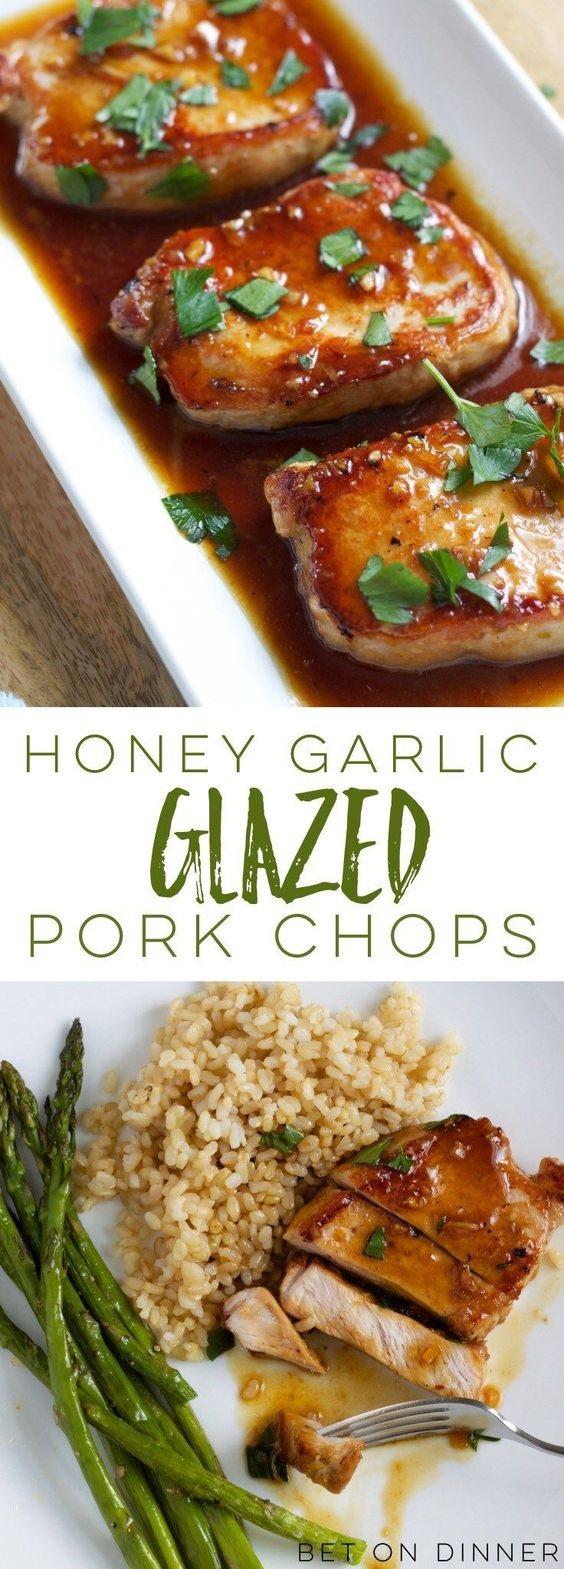 Honey Garlic Pork Chops